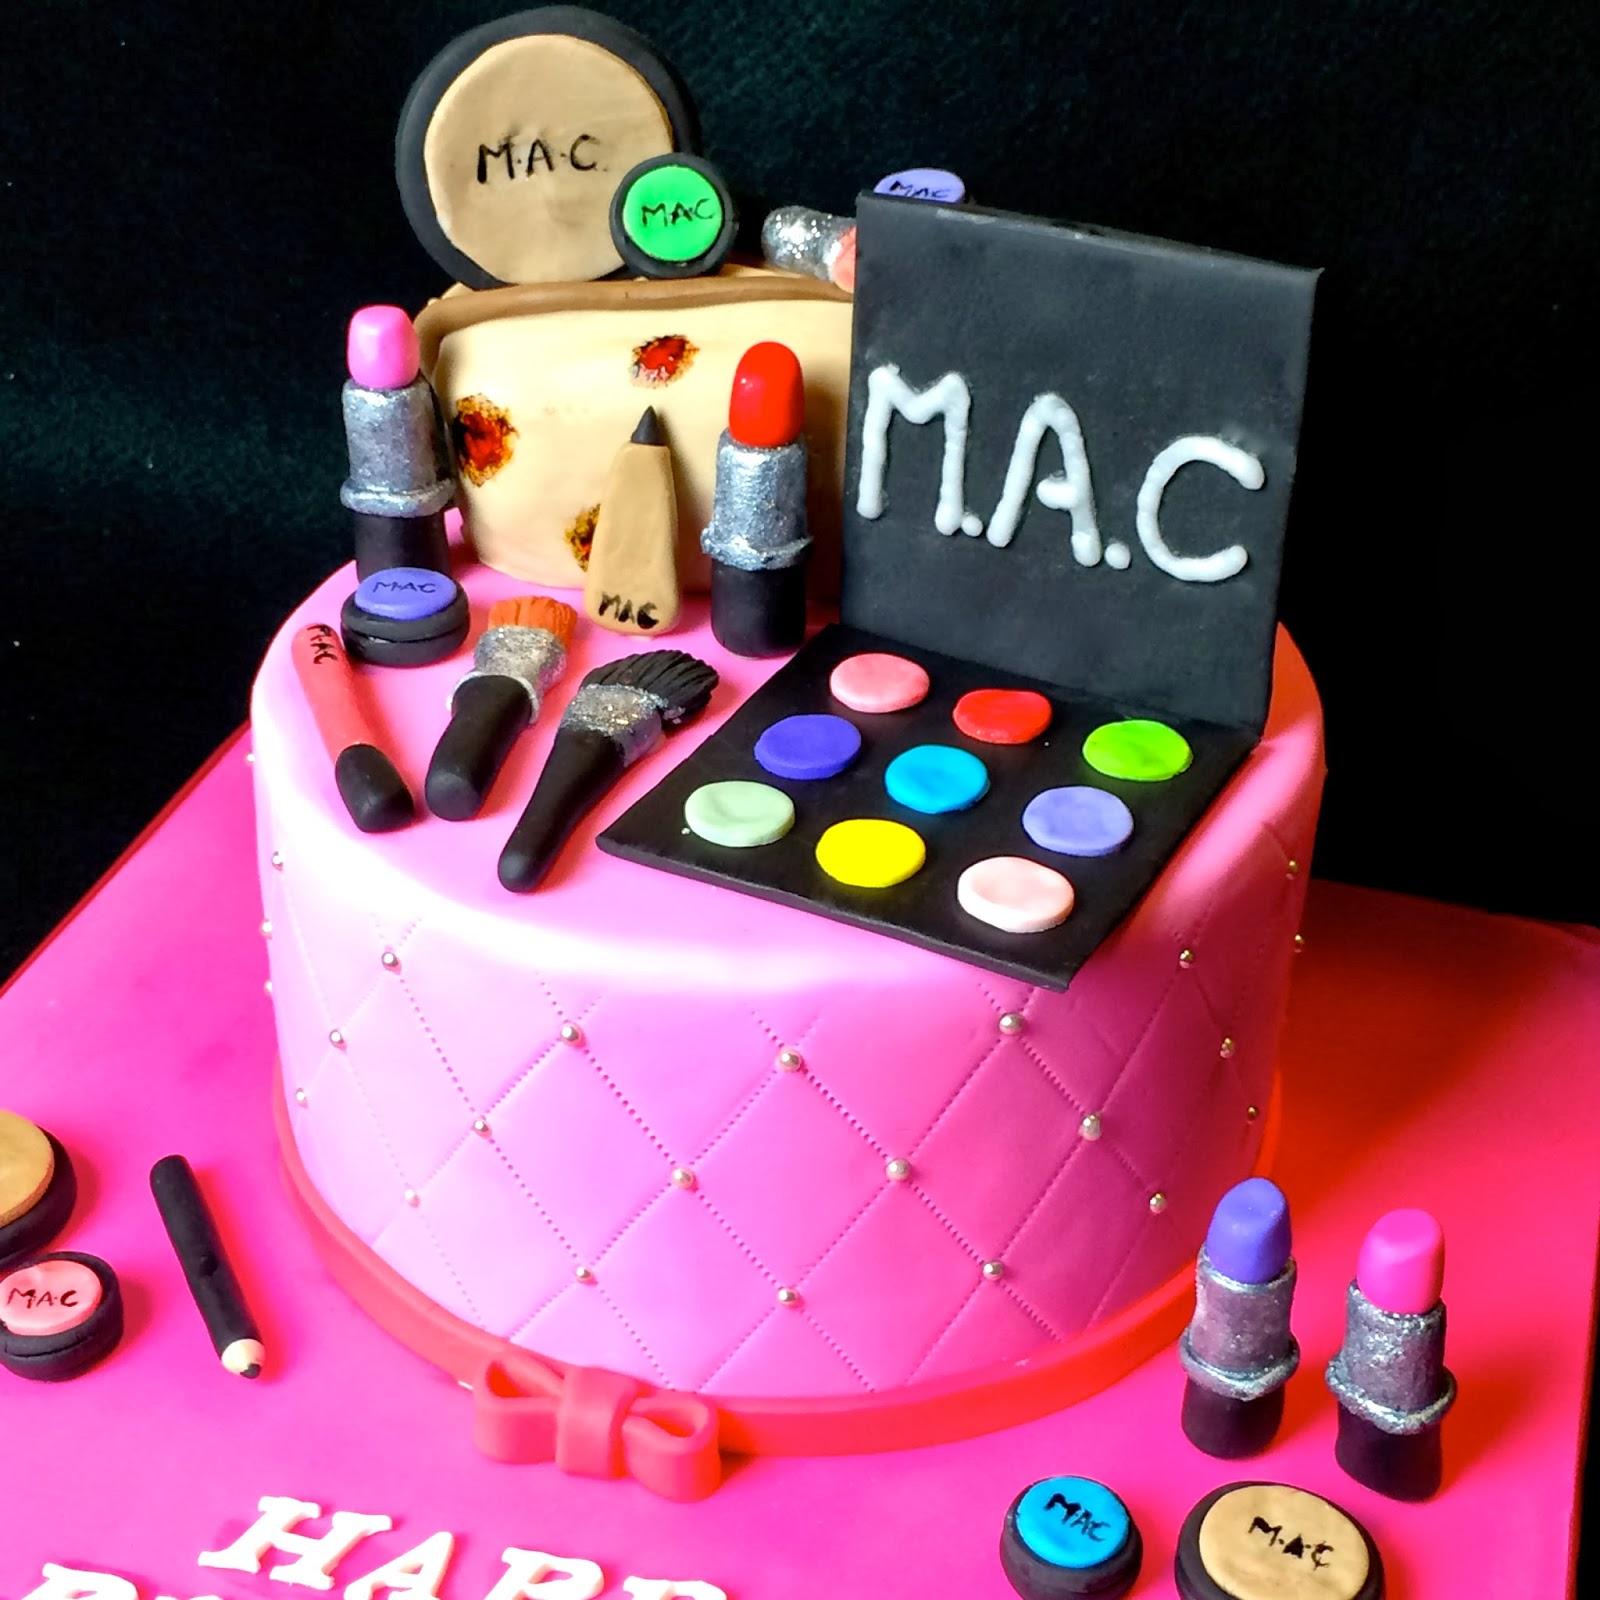 Makeup Themed Cake Images : Baking Maniac: Eggless Choco Orange Makeup Themed Cake